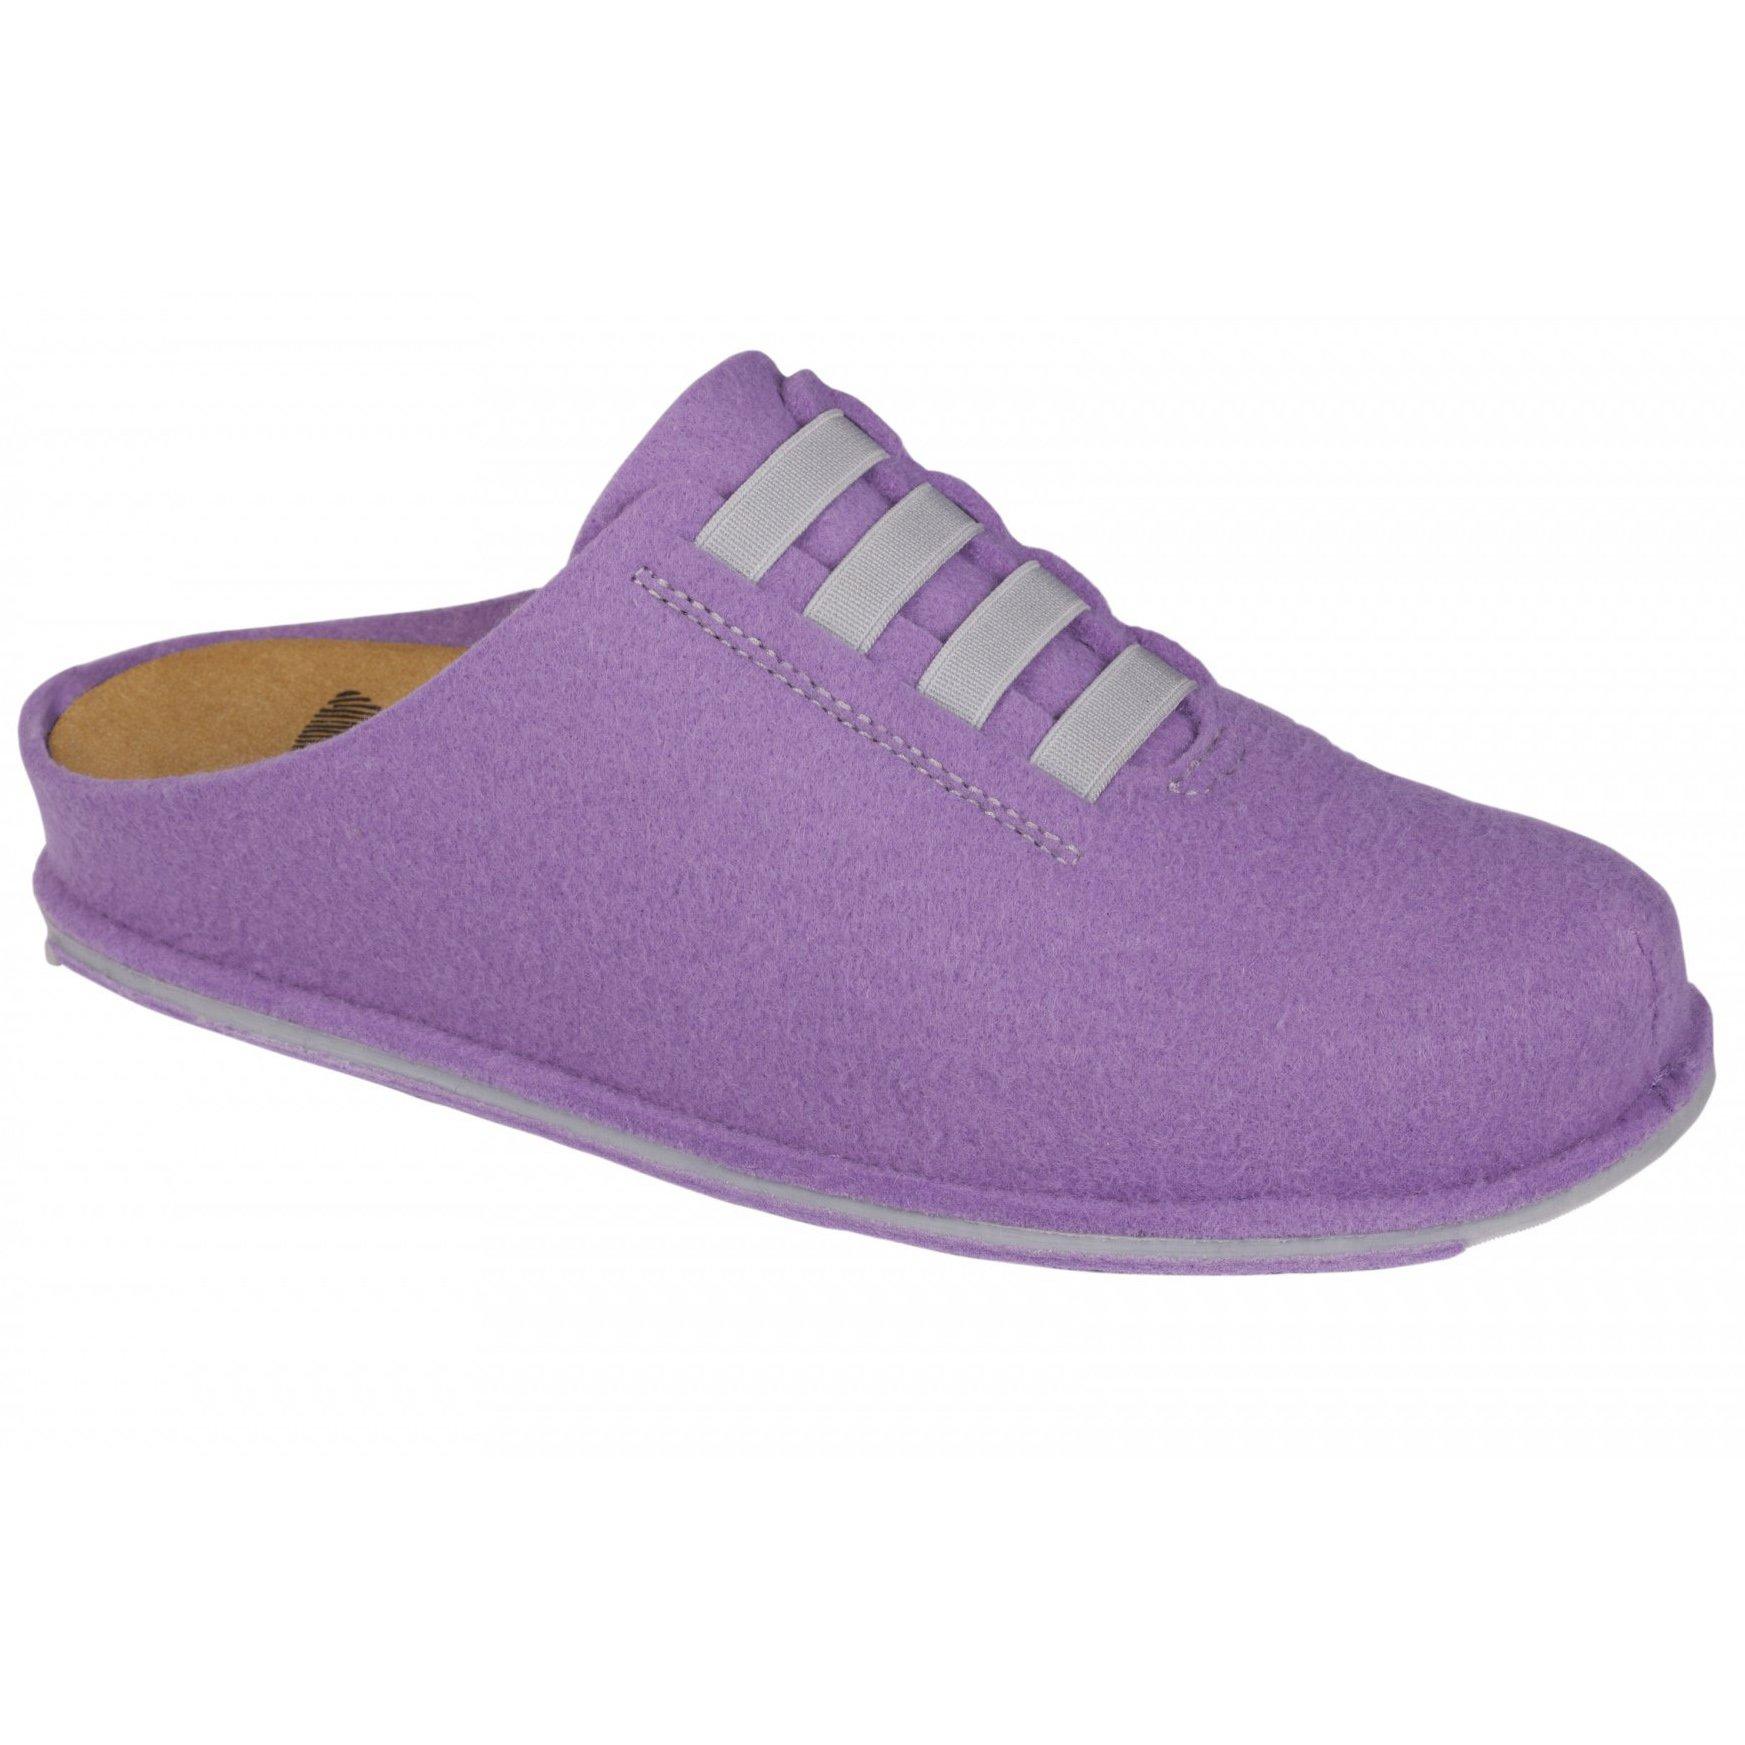 ff91312cc963 Dr Scholl Shoes Spikey10 Λιλά-Γκρι Γυναικείες Ανατομικές Παντόφλες Χαρίζουν  Σωστή Στάση, Φυσικό Χωρίς Πόνο Βάδισμα 1 Ζε..